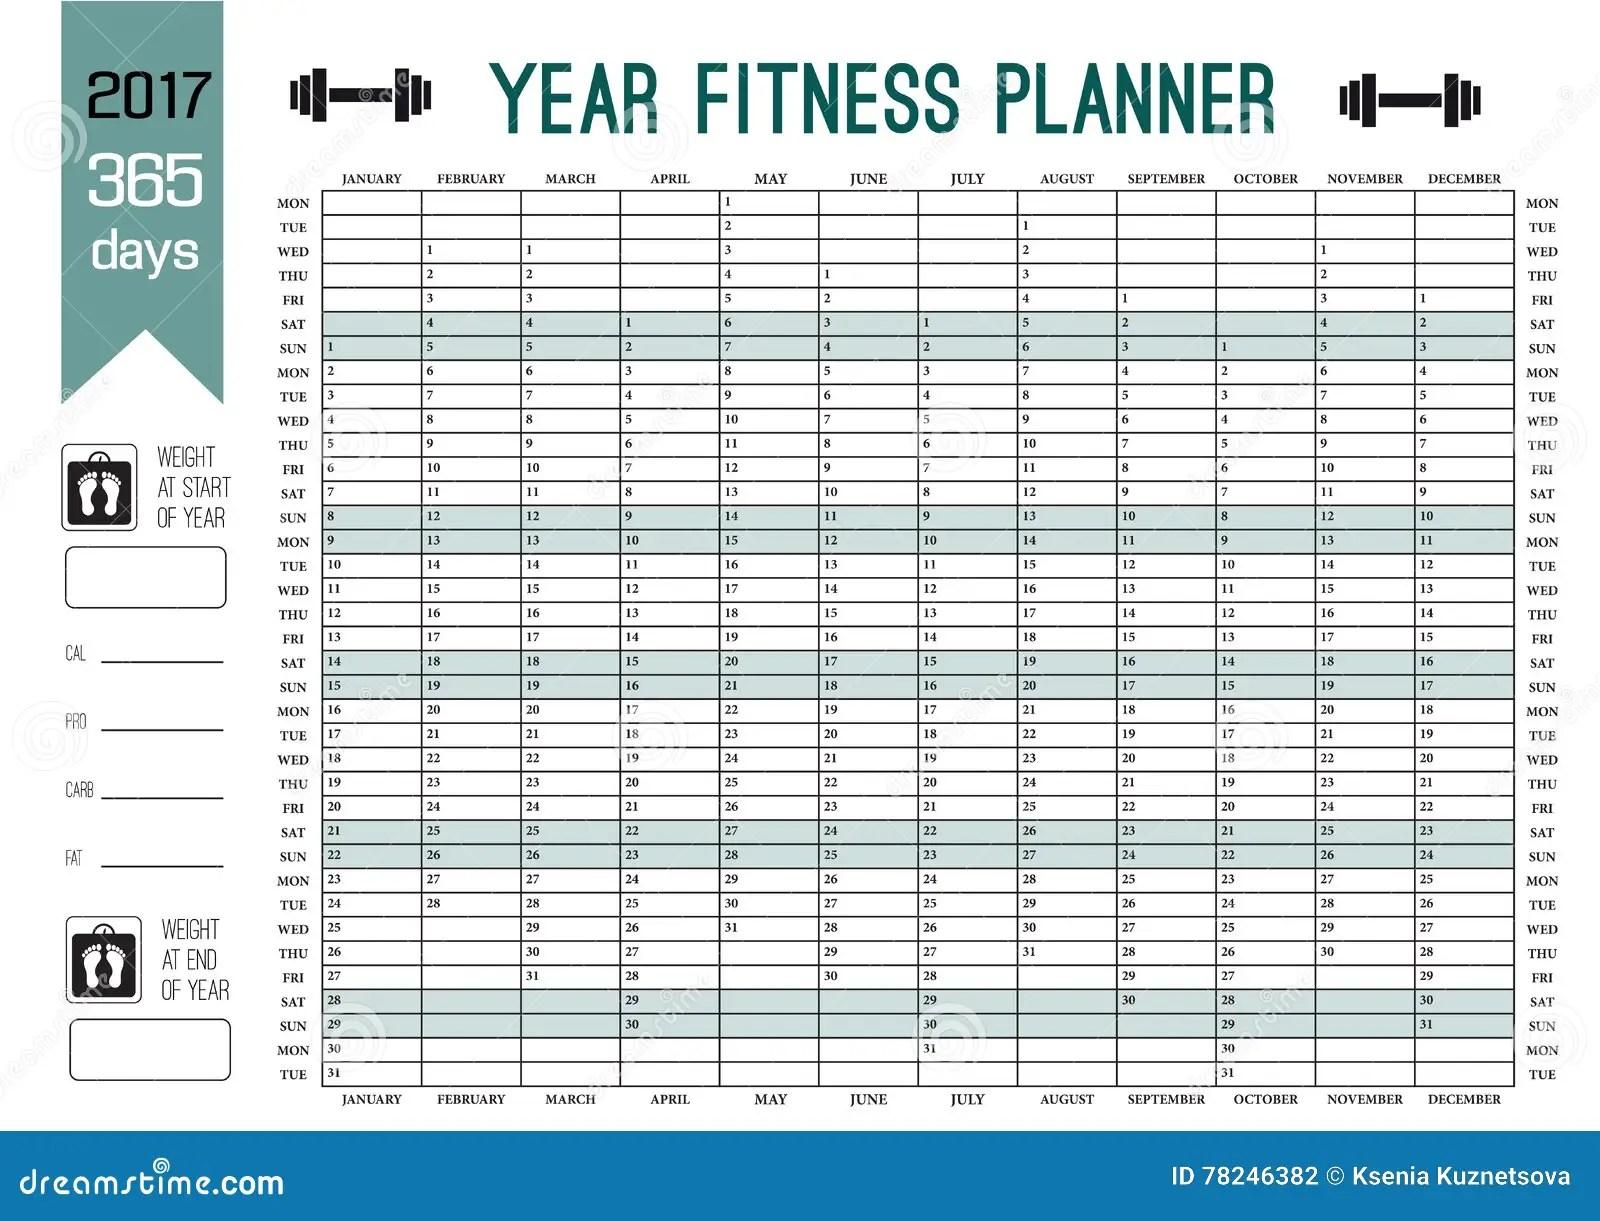 Meal Planning Worksheet Fitness